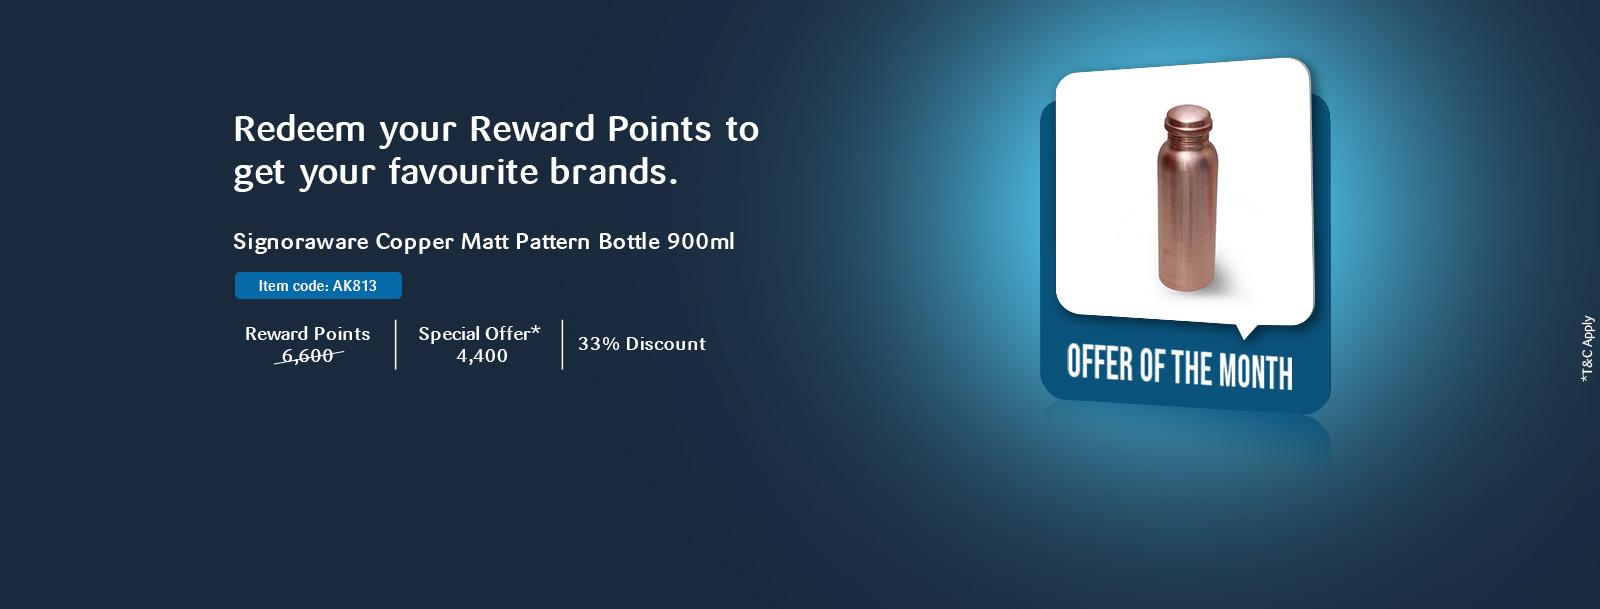 SBI Credit Card Rewards - Redeem Reward Points   SBI Cards